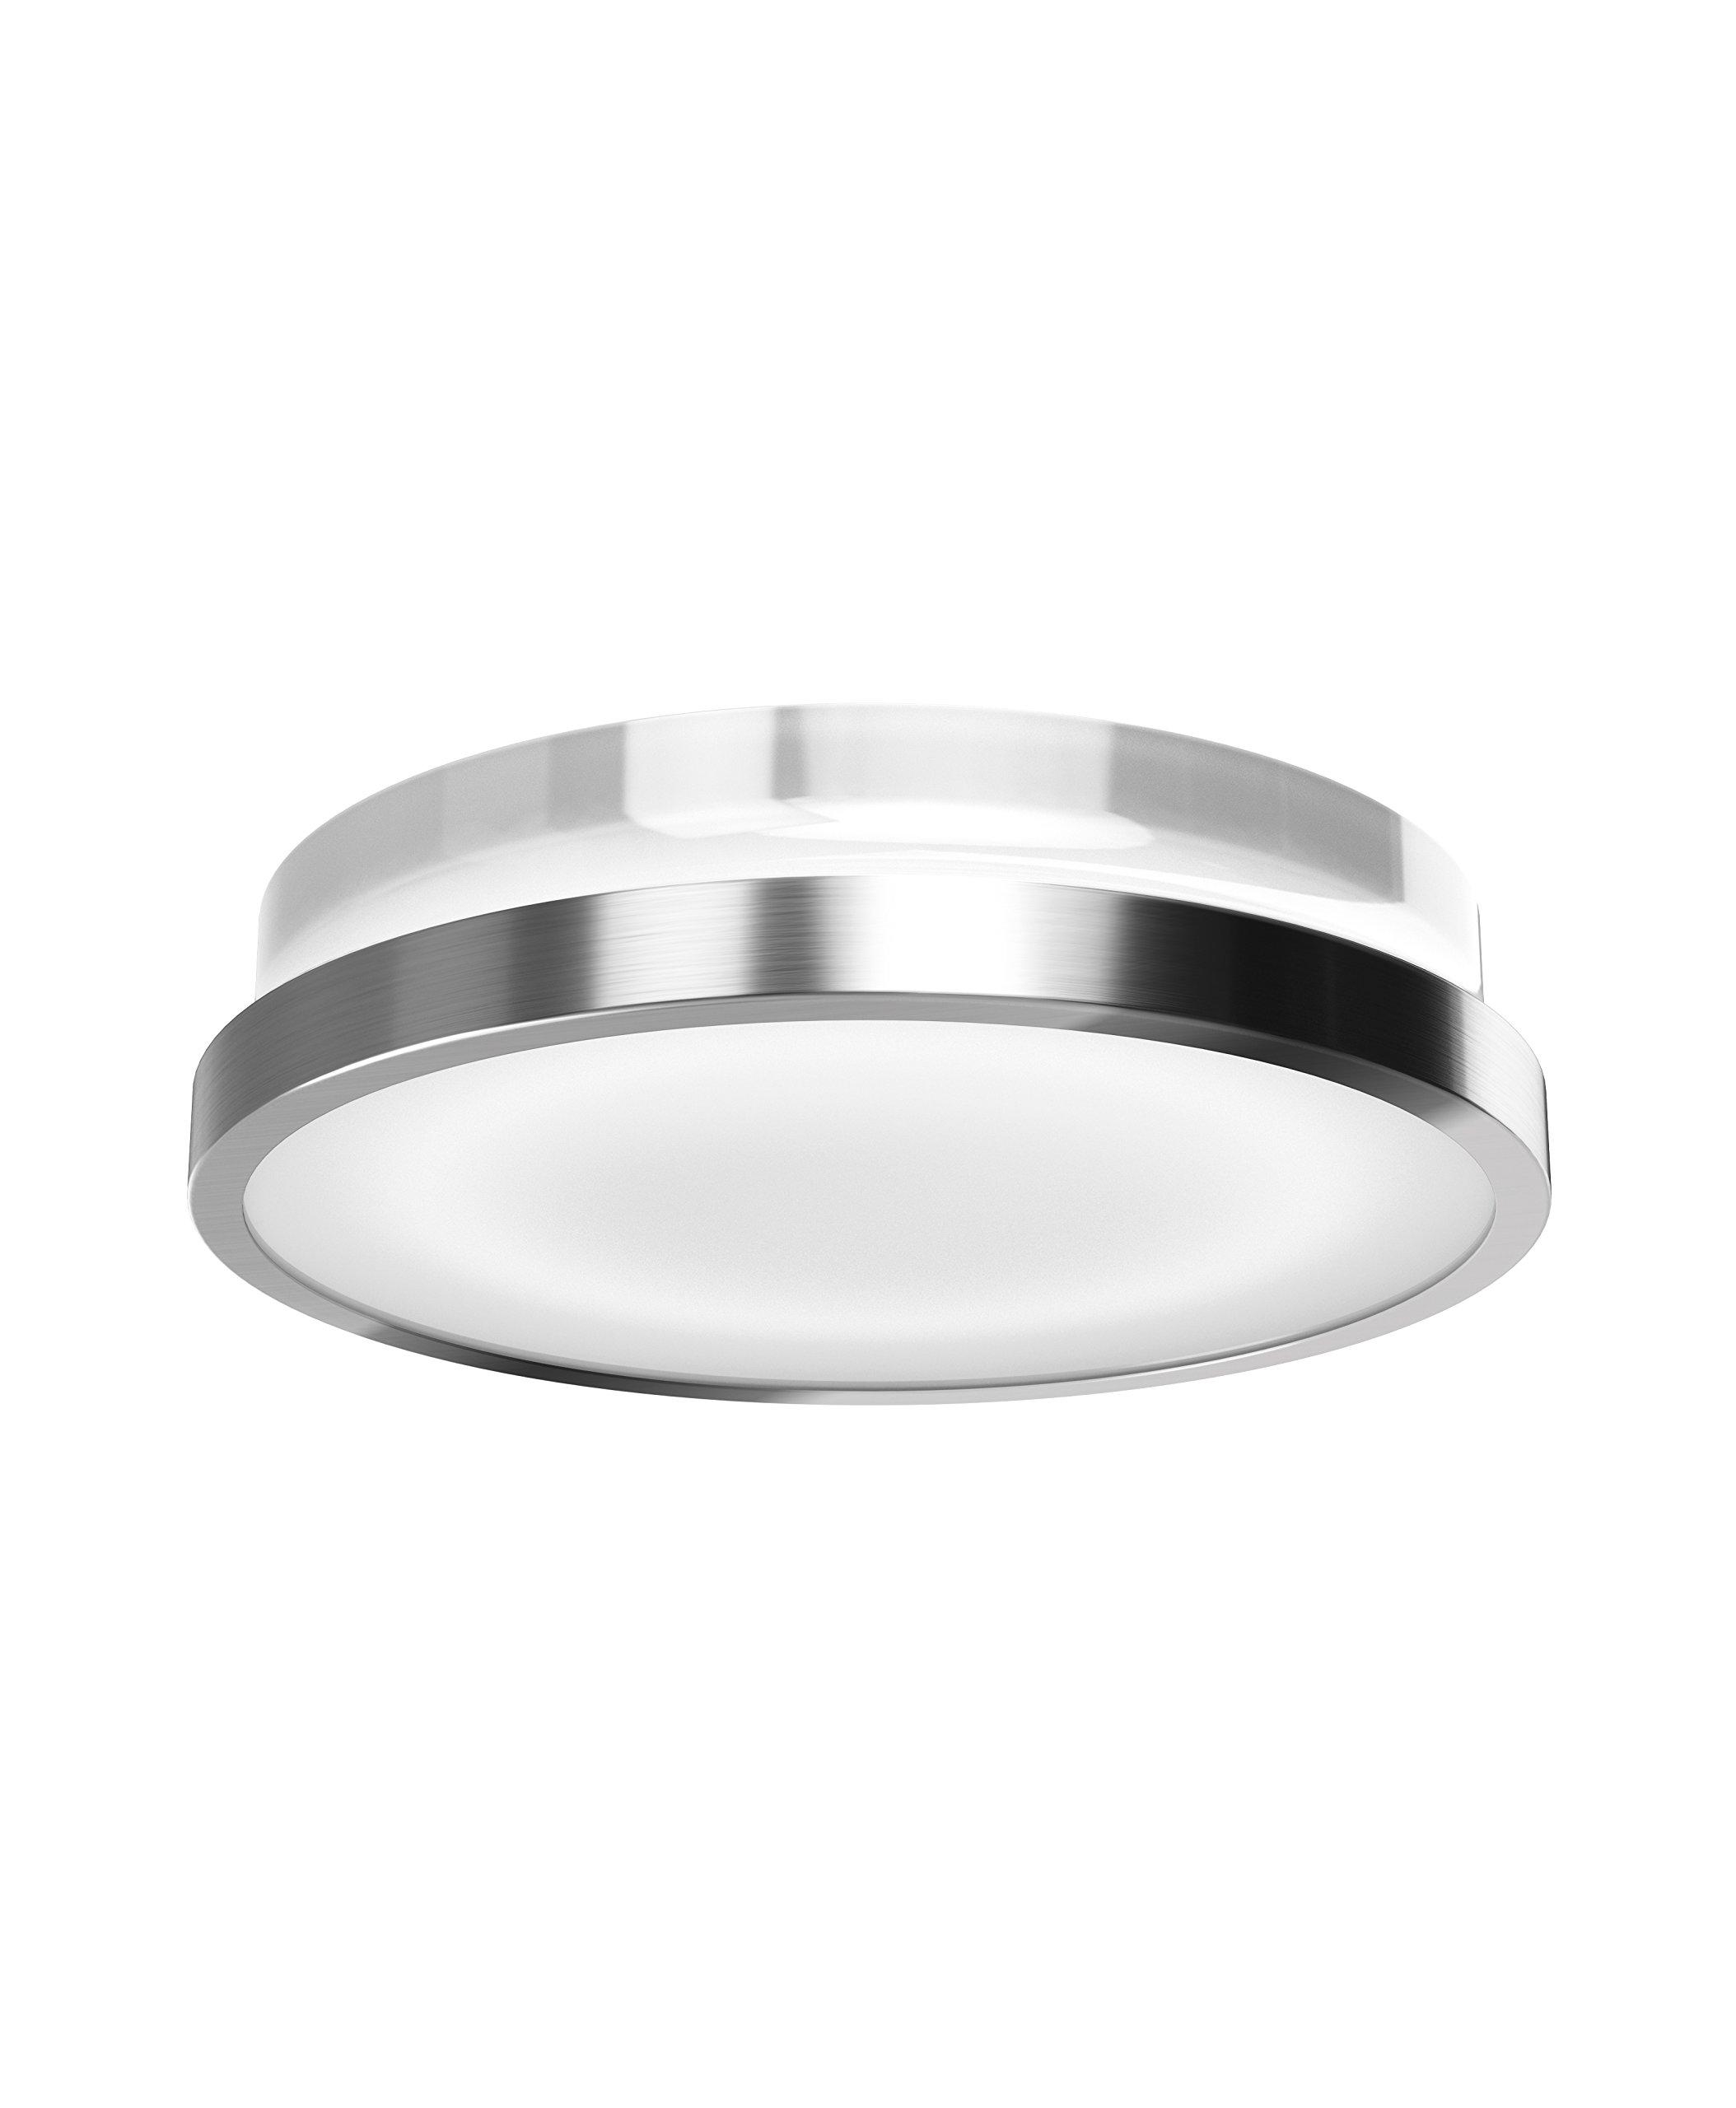 osram noxlite circular led outdoor light with motion sensor and twilight sens ebay. Black Bedroom Furniture Sets. Home Design Ideas